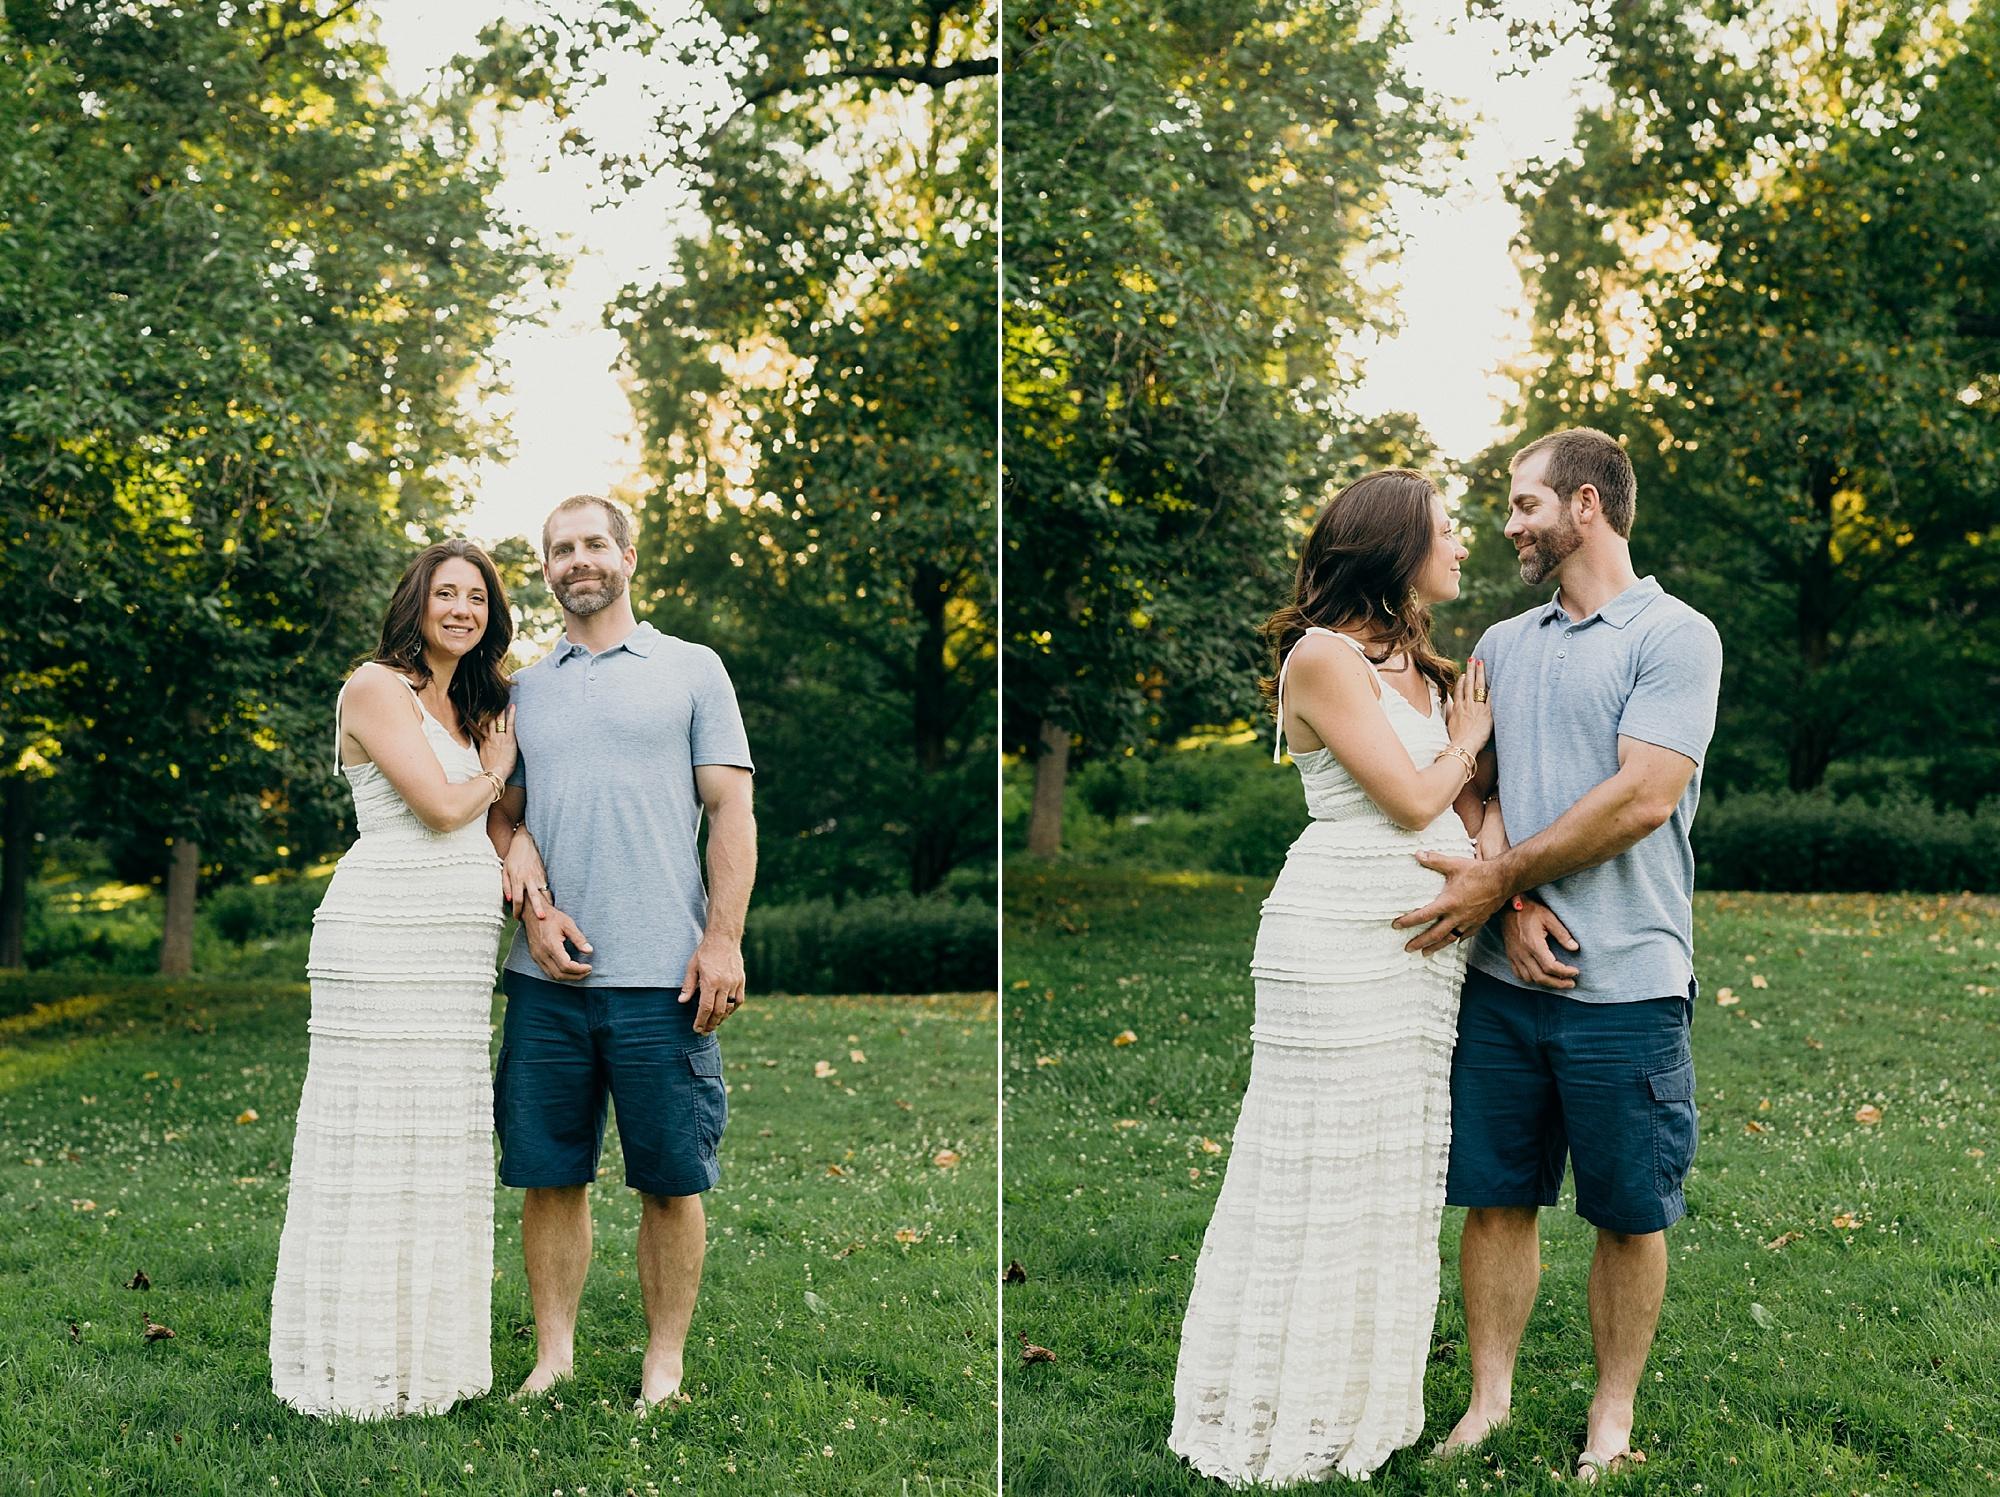 Joe_Mac_Creative_Maternity_West_Chester_Wedding_Photography_Philly_Best_Philadlephia__0171.jpg